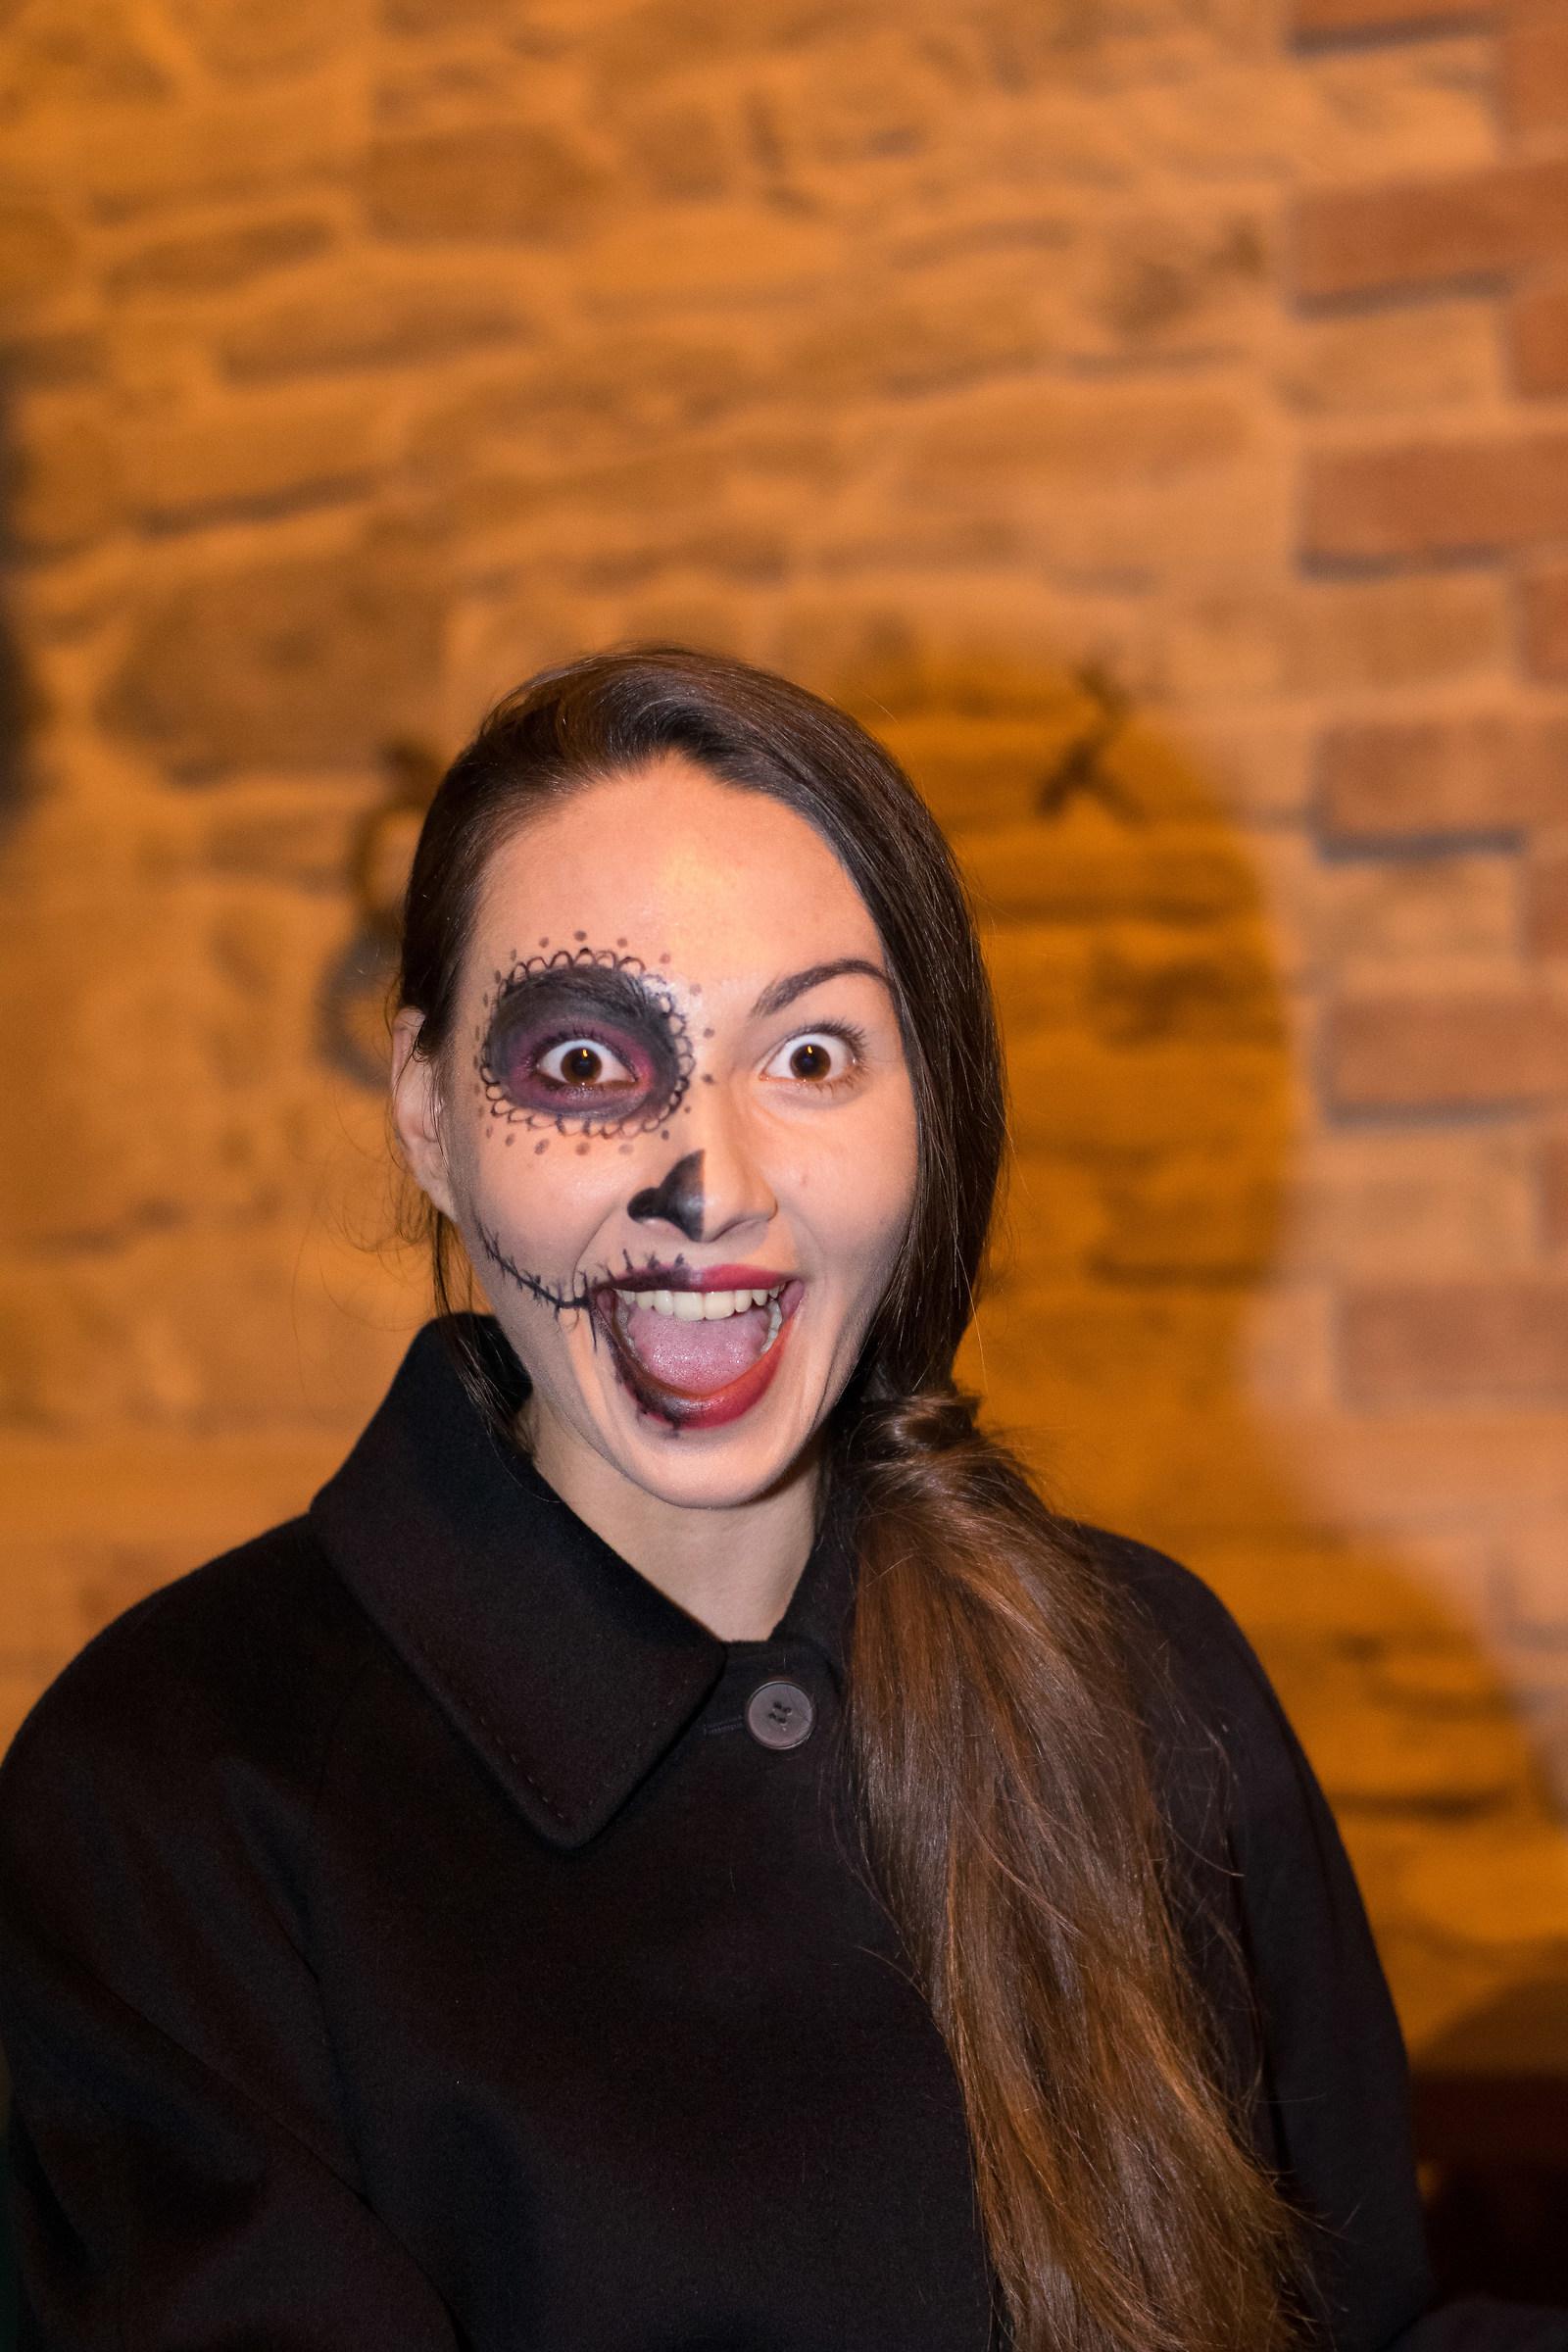 Halloween 2016...